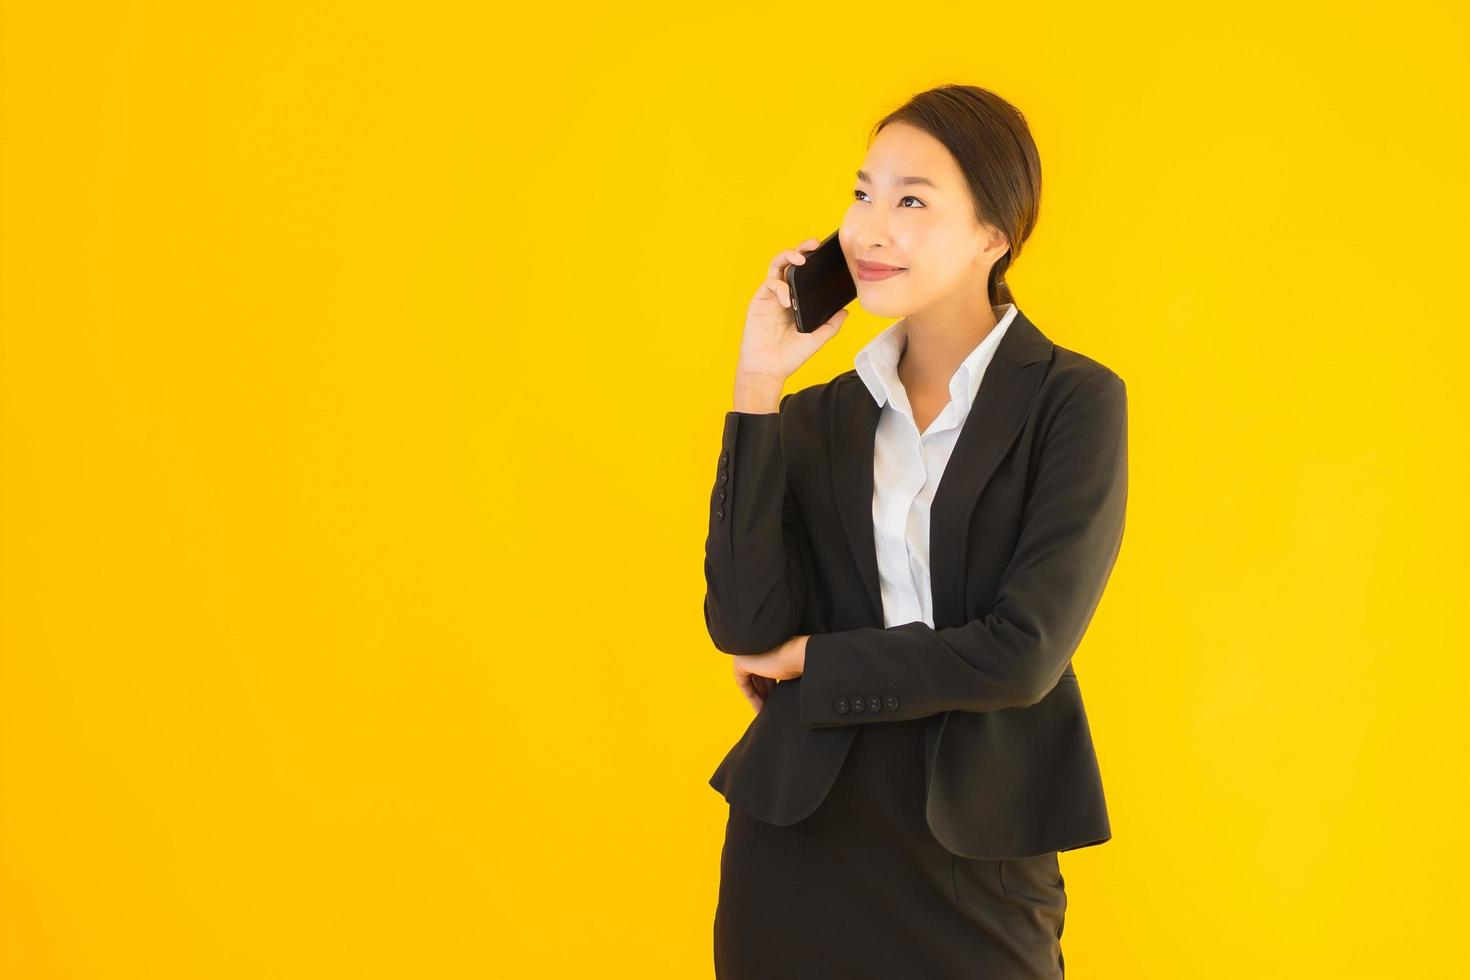 Businesswoman on telephone photo